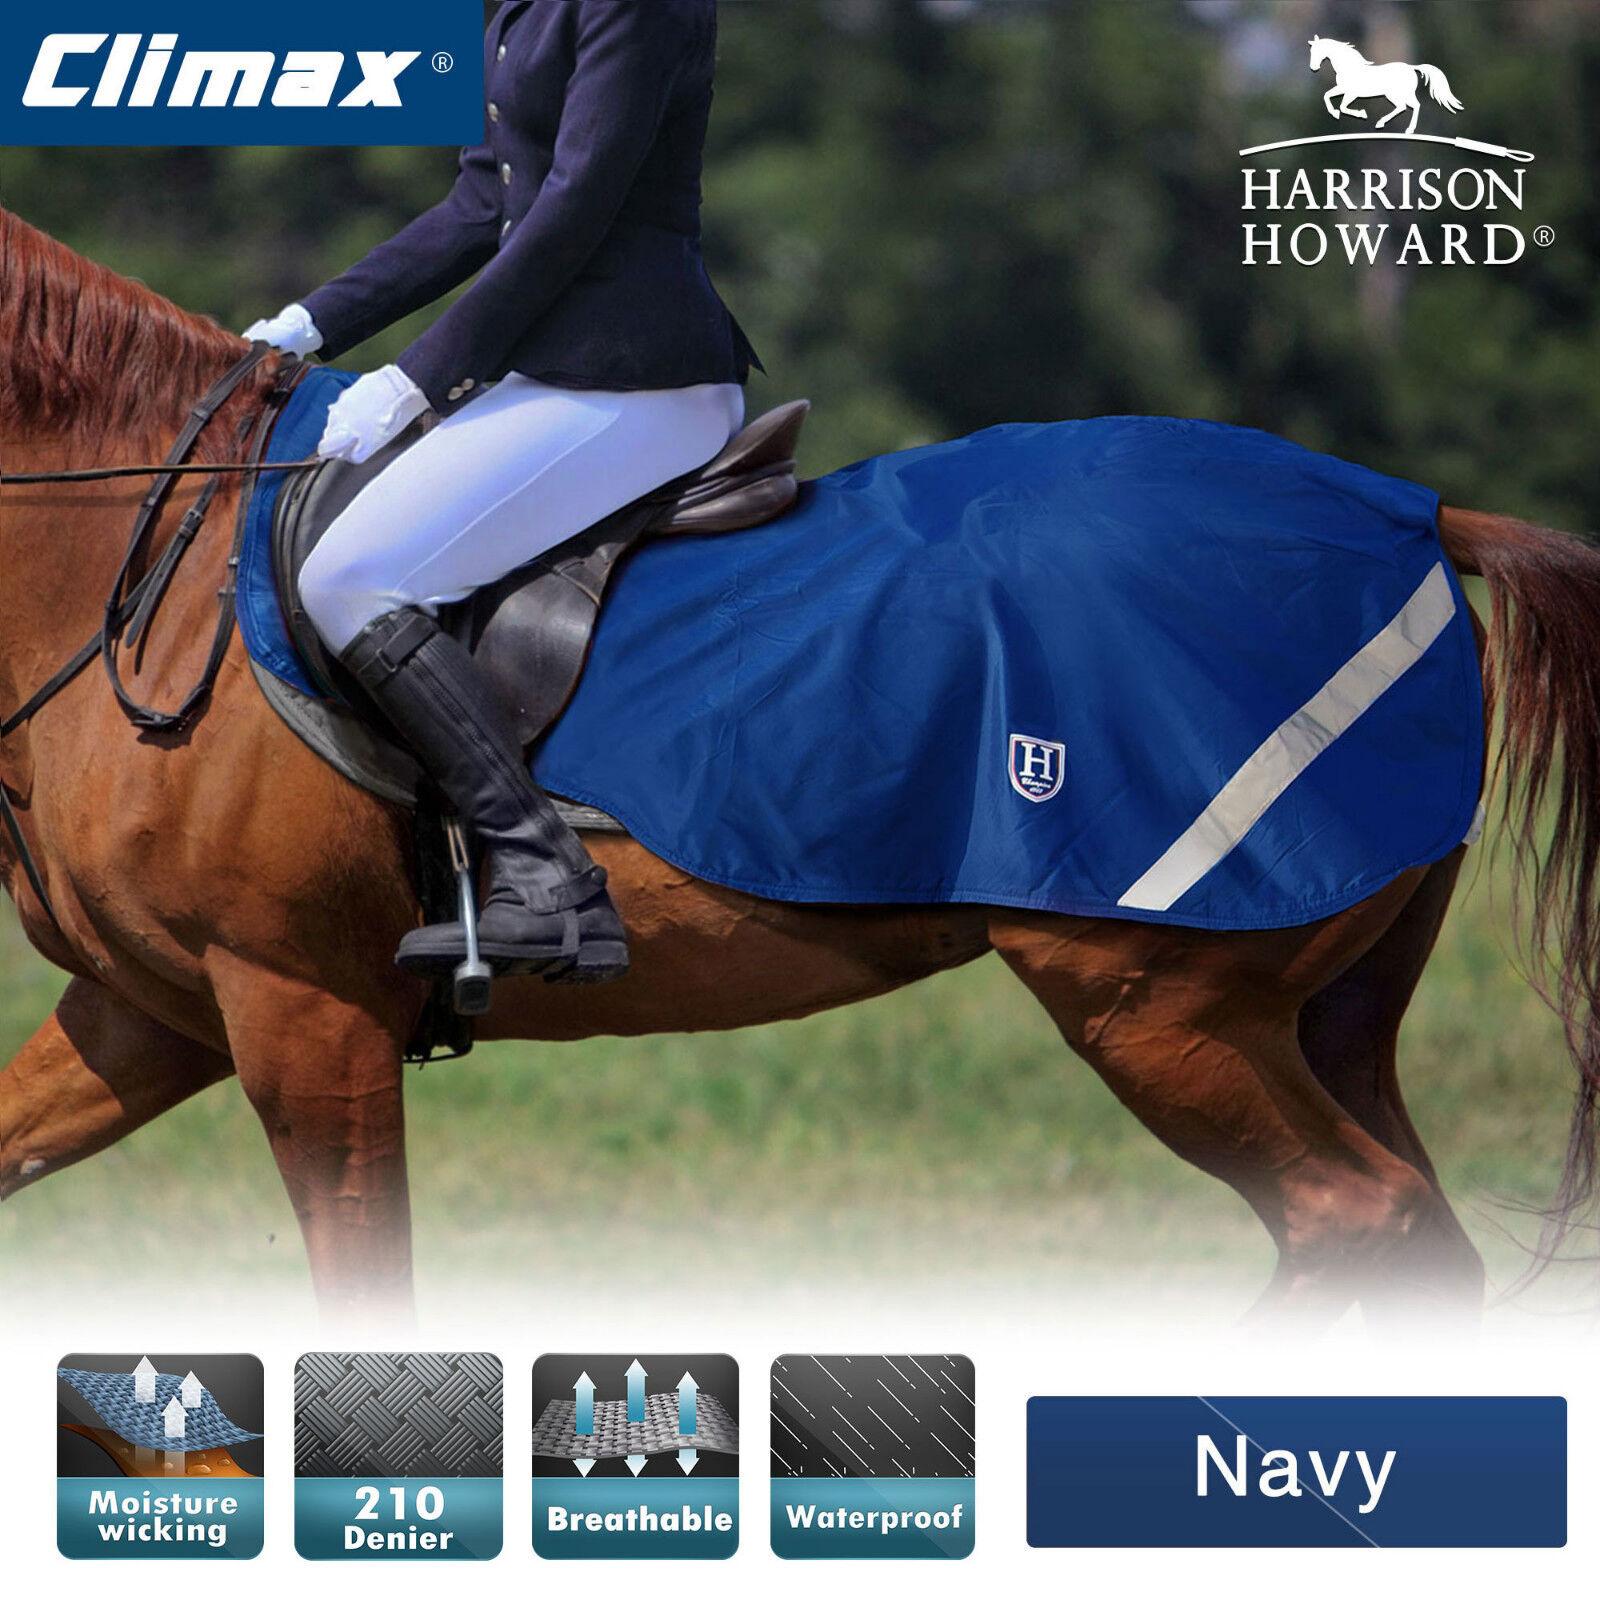 Harrison Howard Climax Exercise sheet Waterproof Hi-Vis Fleece Navy